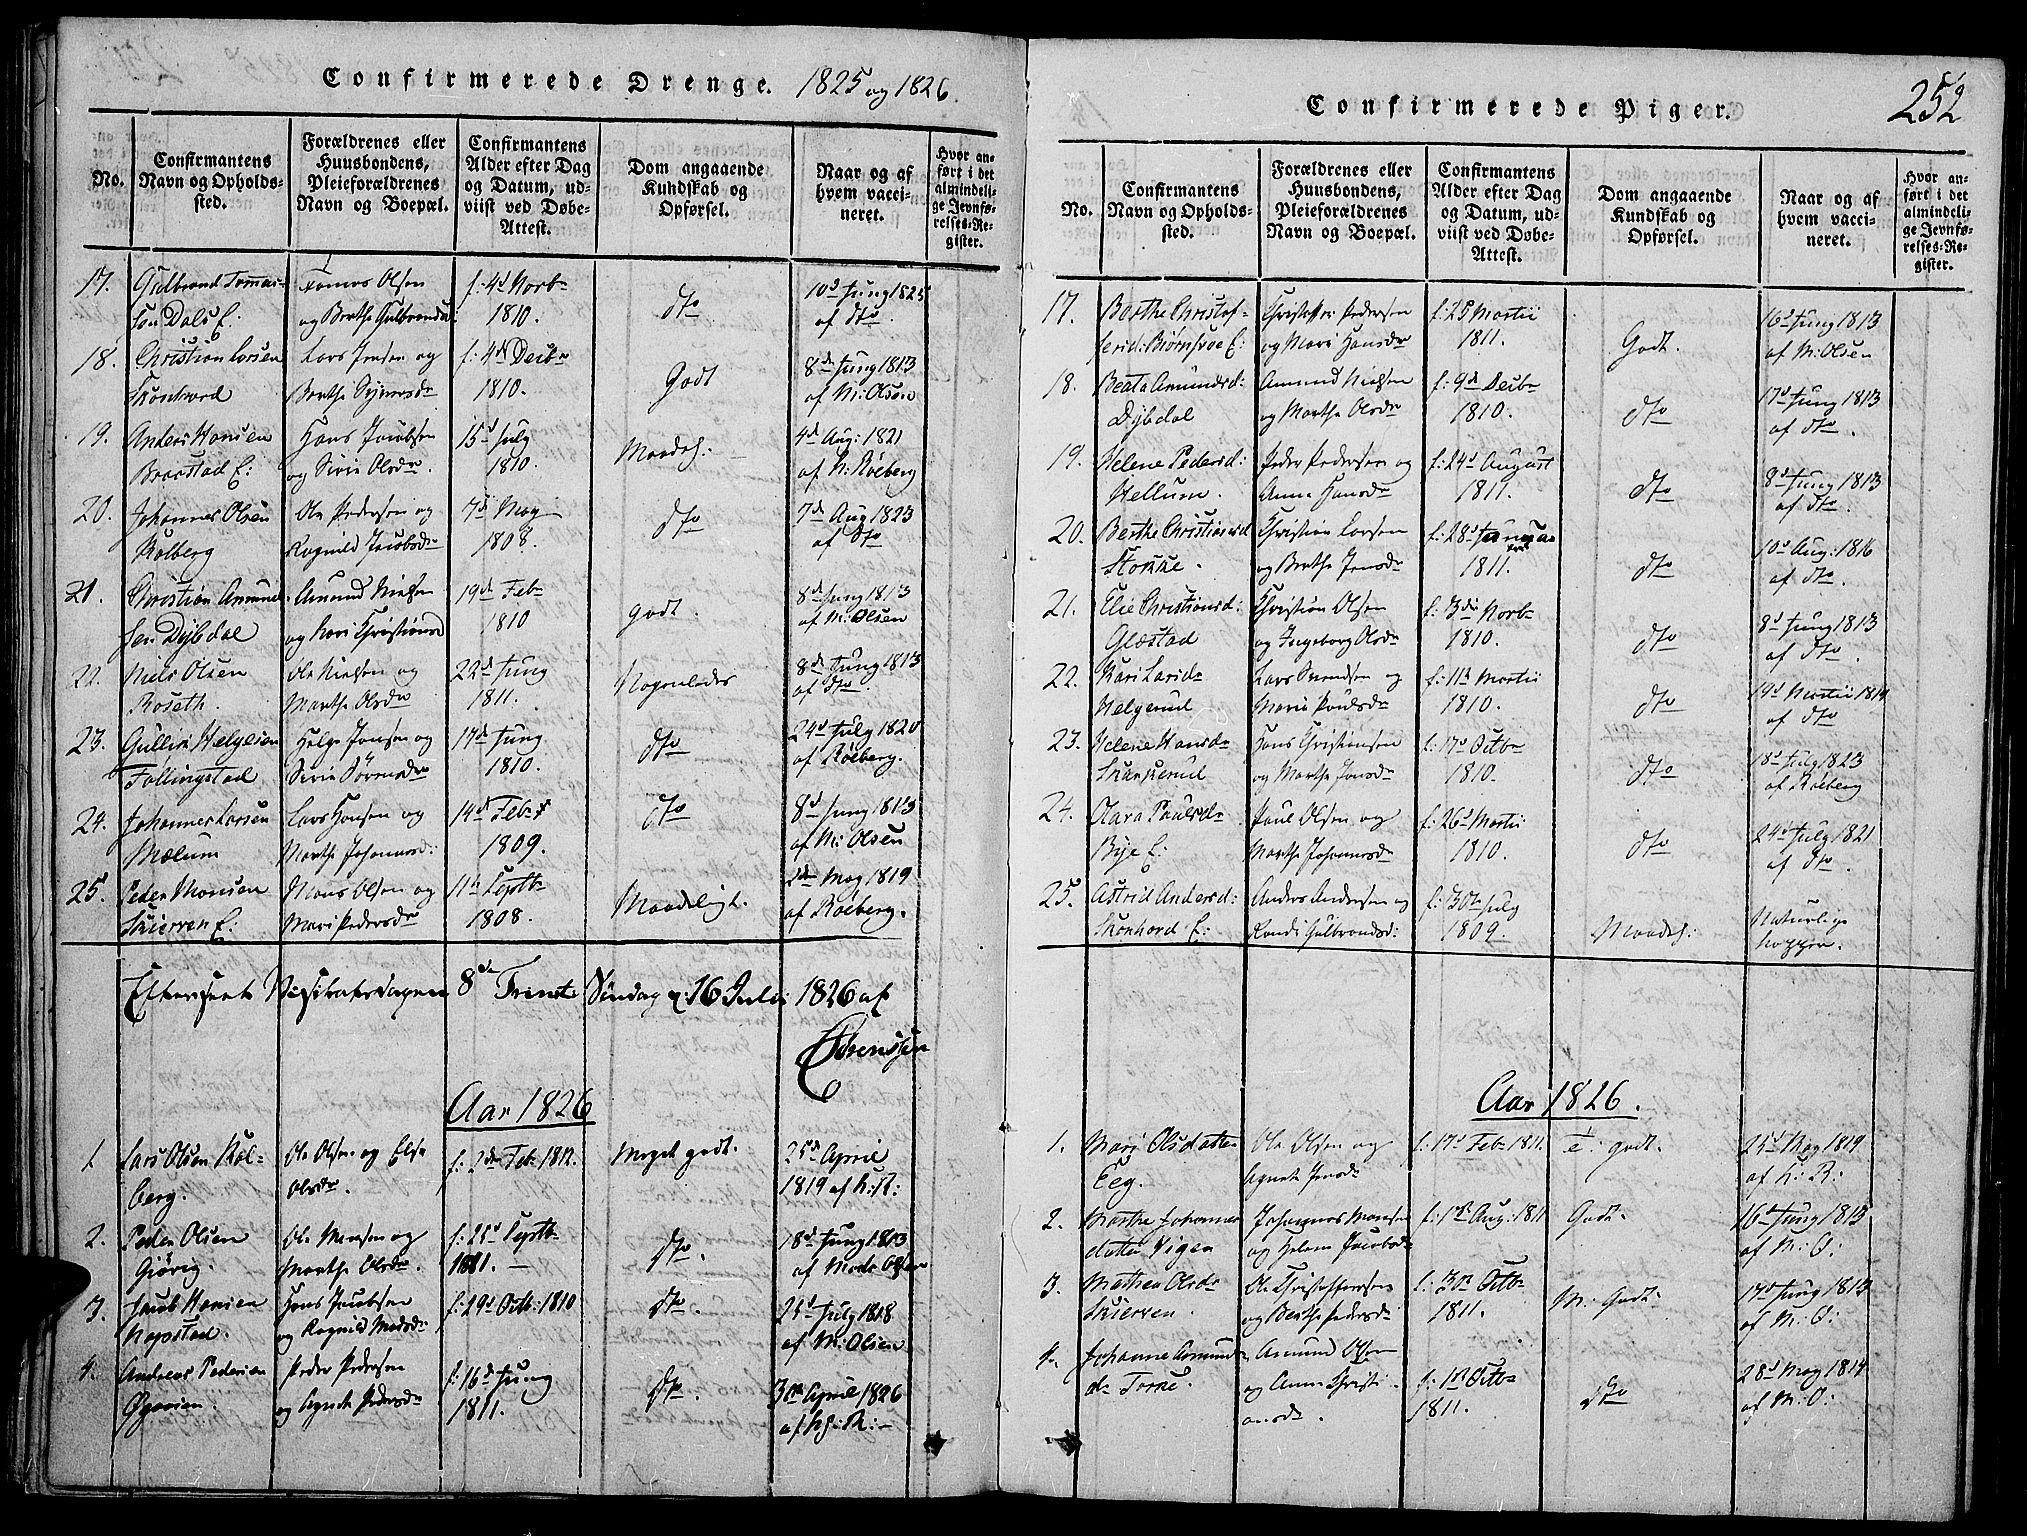 SAH, Vardal prestekontor, H/Ha/Haa/L0004: Ministerialbok nr. 4, 1814-1831, s. 252